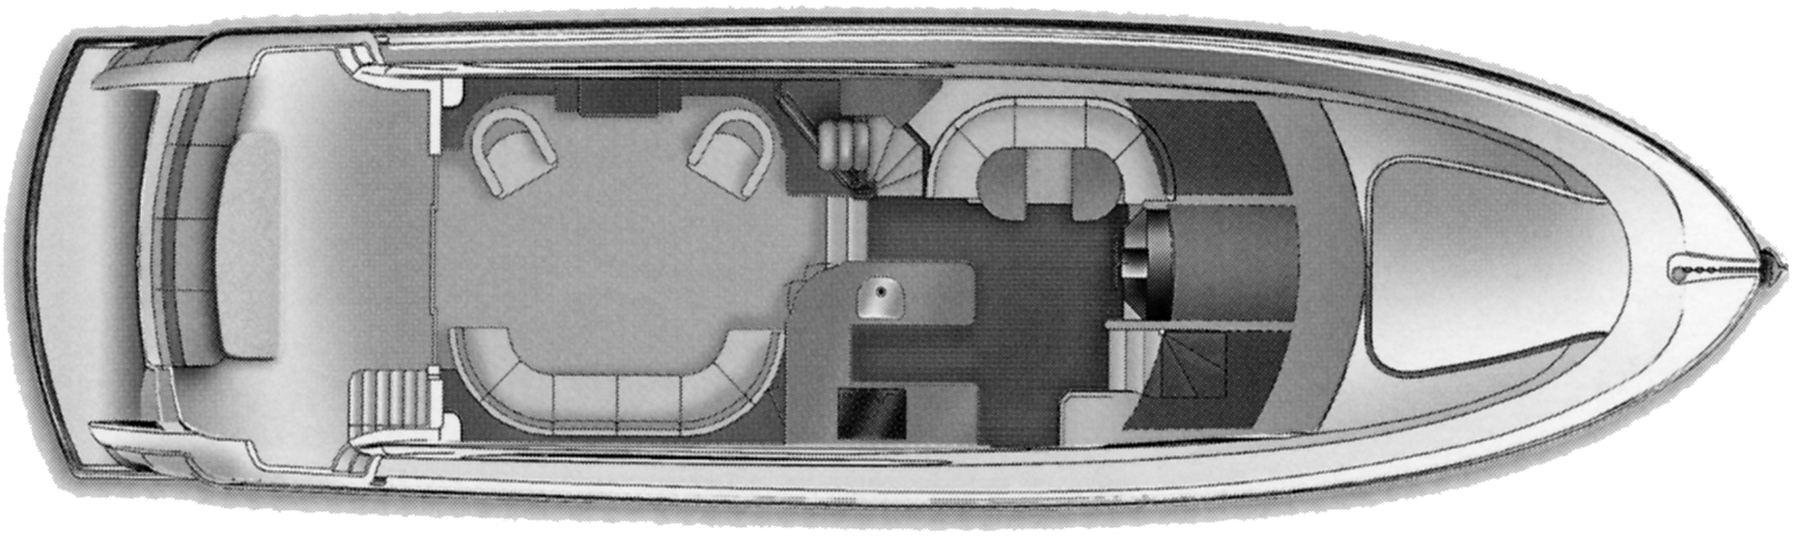 64 Motor Yacht Floor Plan 2